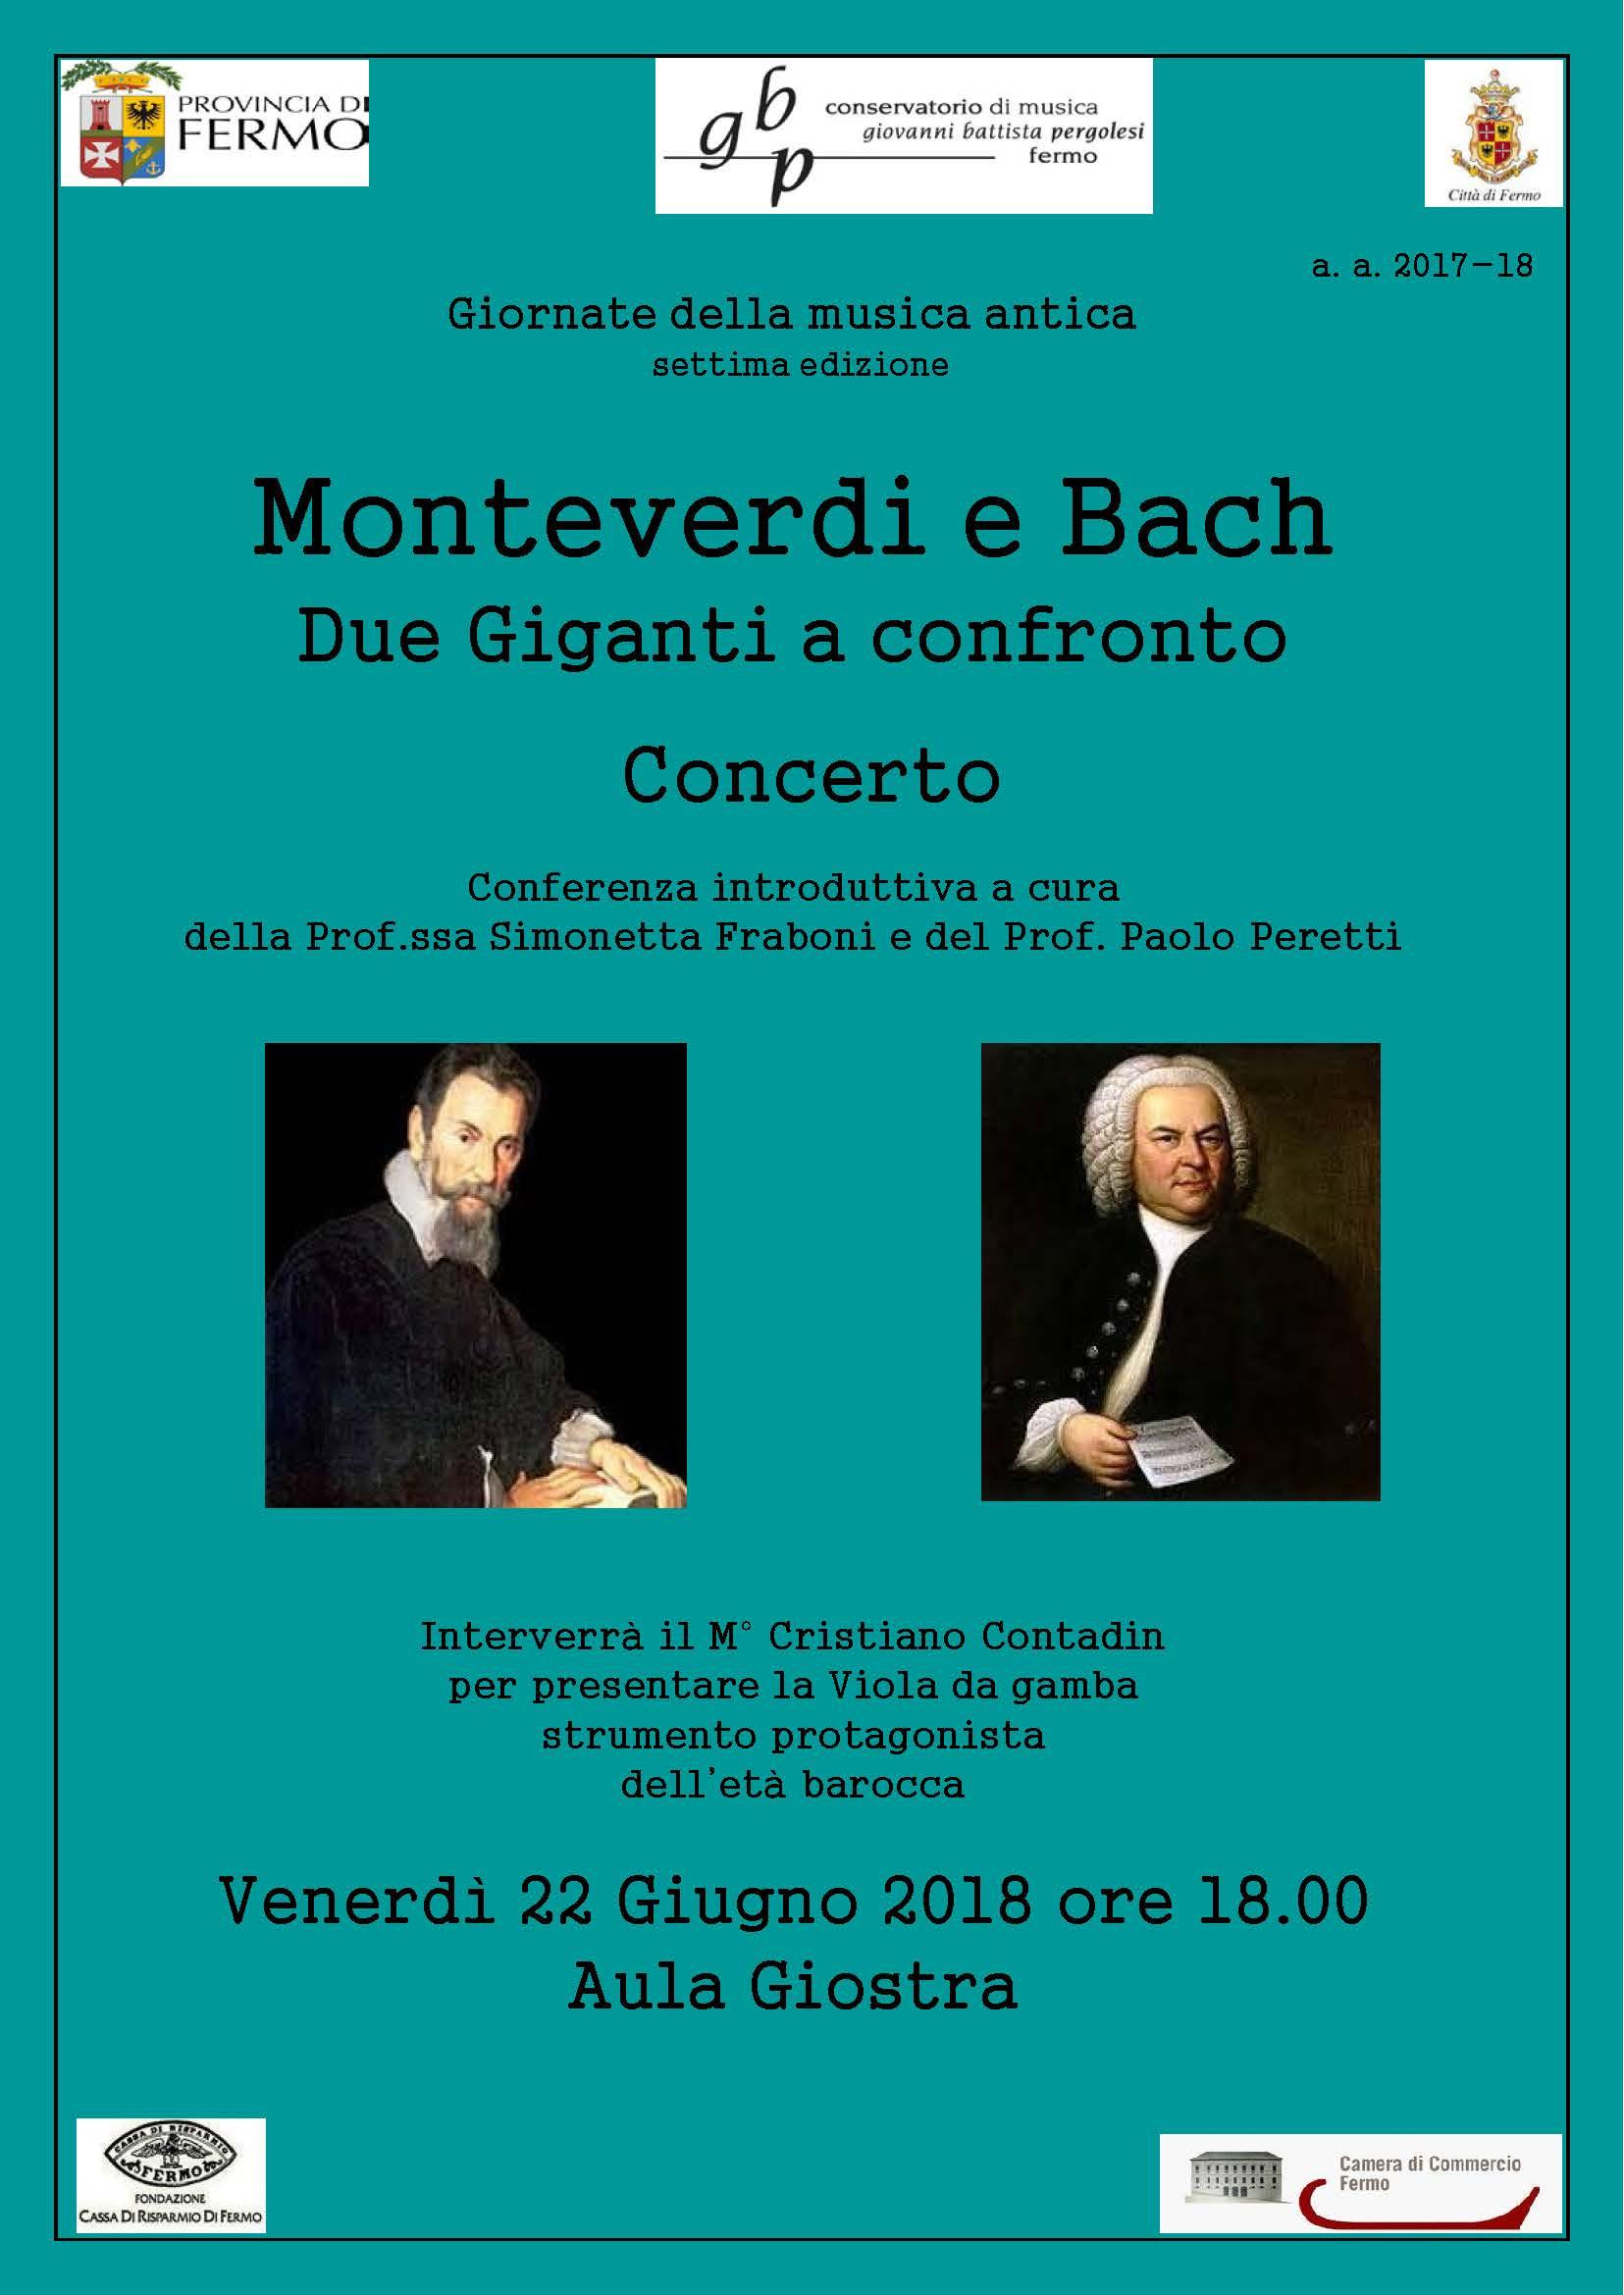 Locandina Monteverdi e Bach1